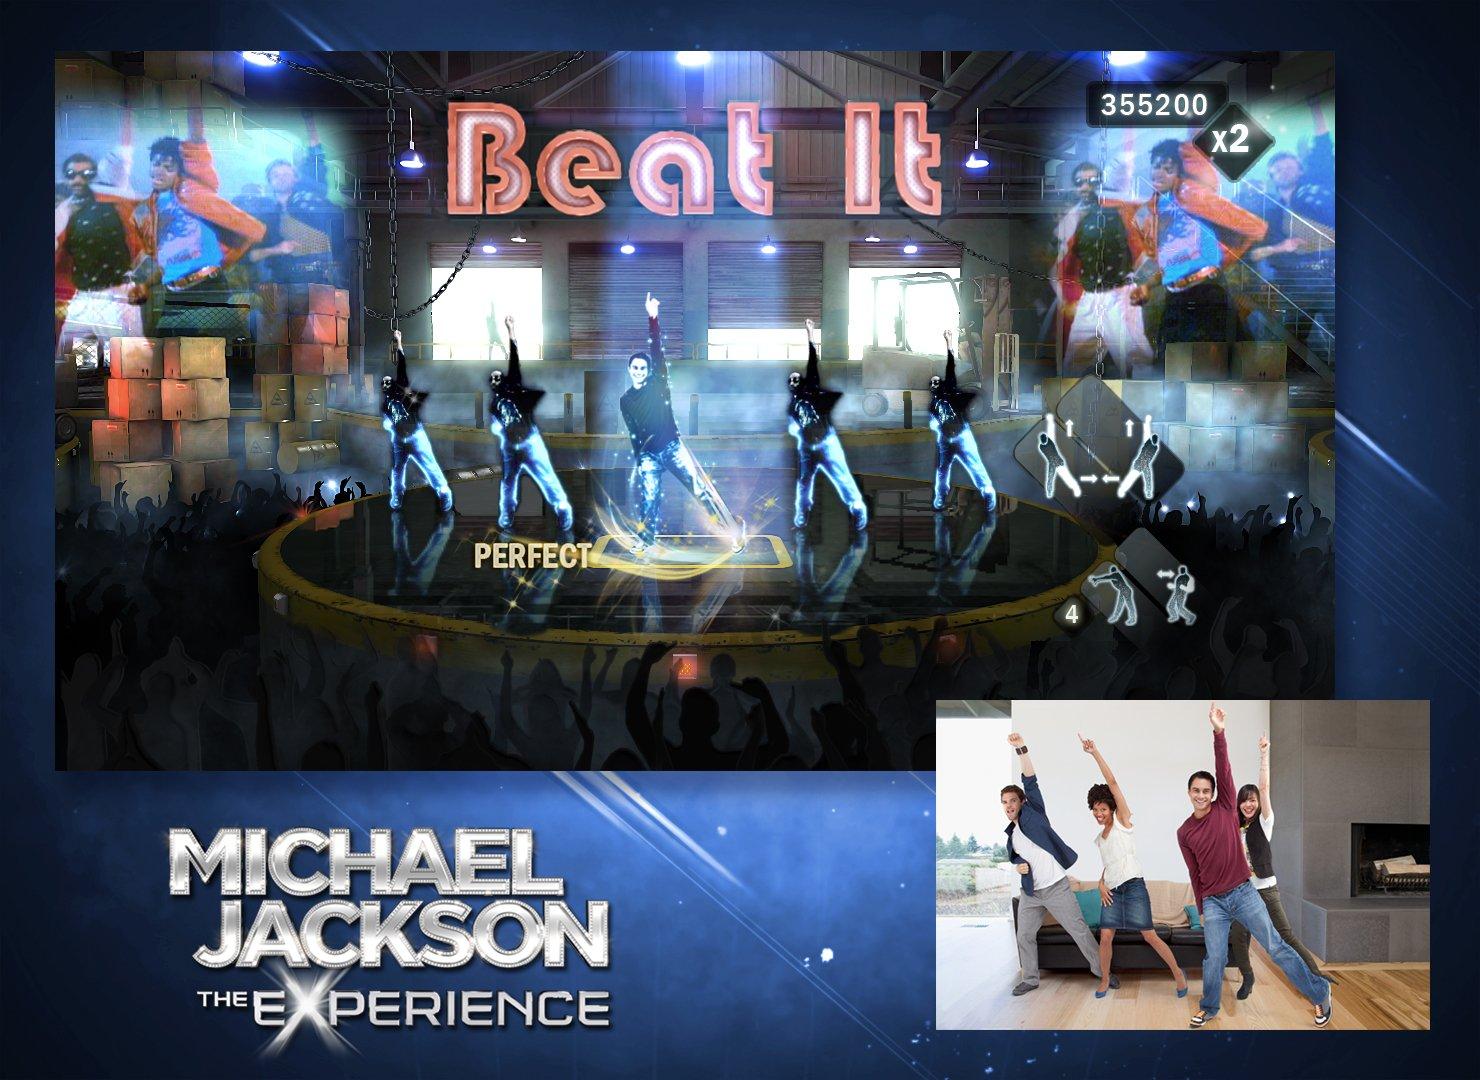 michael jackson the experience xbox 360 standard edition xbox